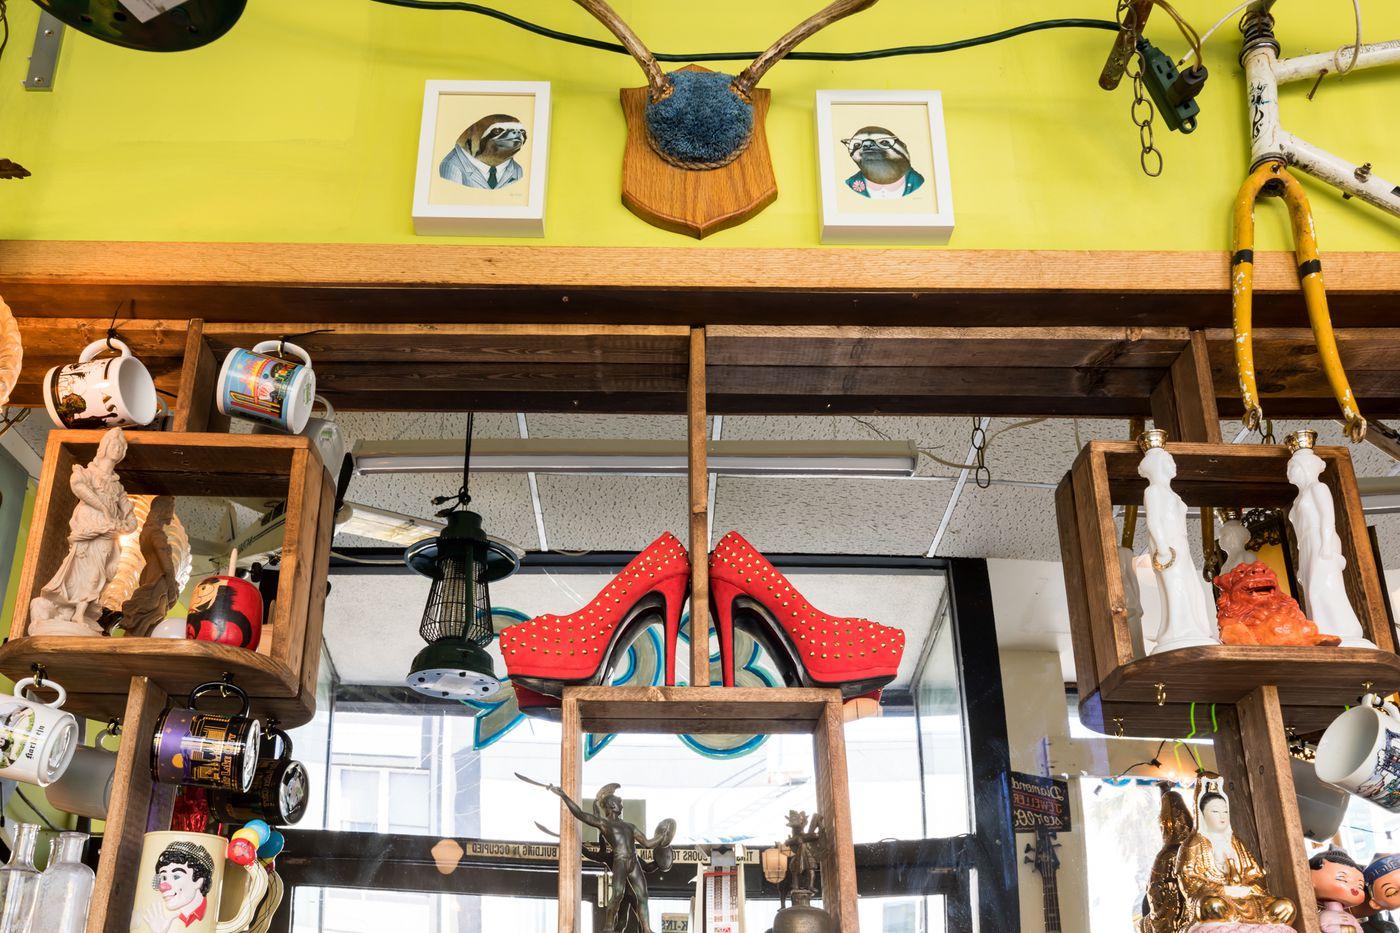 Hidden Tapas Restaurant From Monarch Team Opens Behind Fake